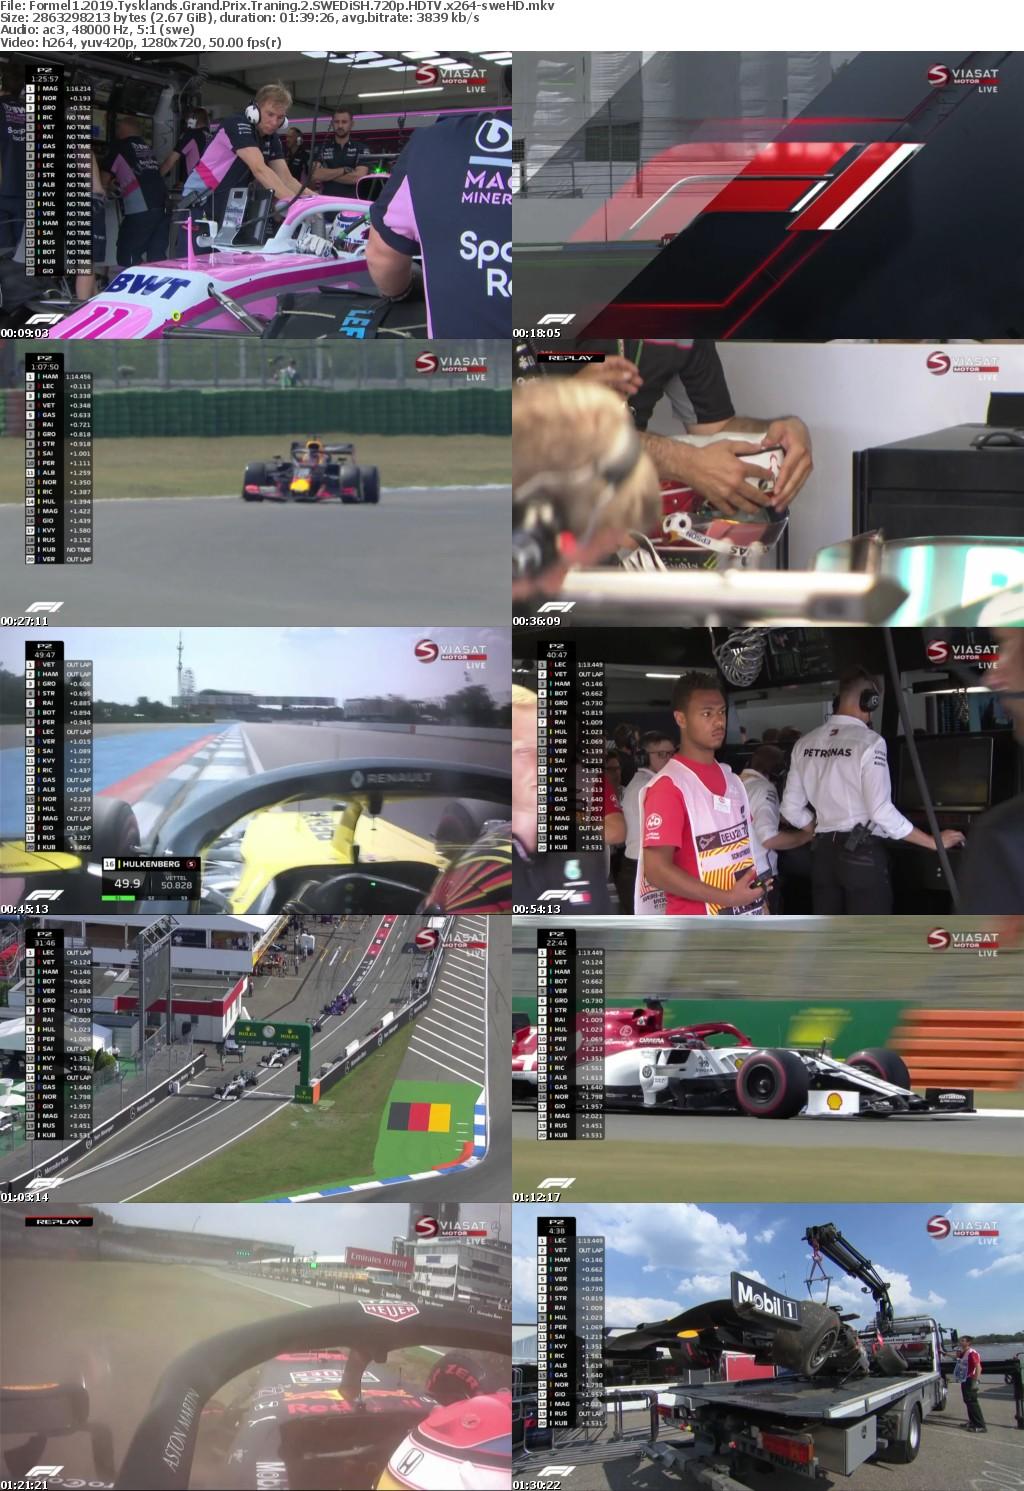 Formel1 2019 Tysklands Grand Prix Traning 2 SWEDiSH 720p HDTV x264-sweHD